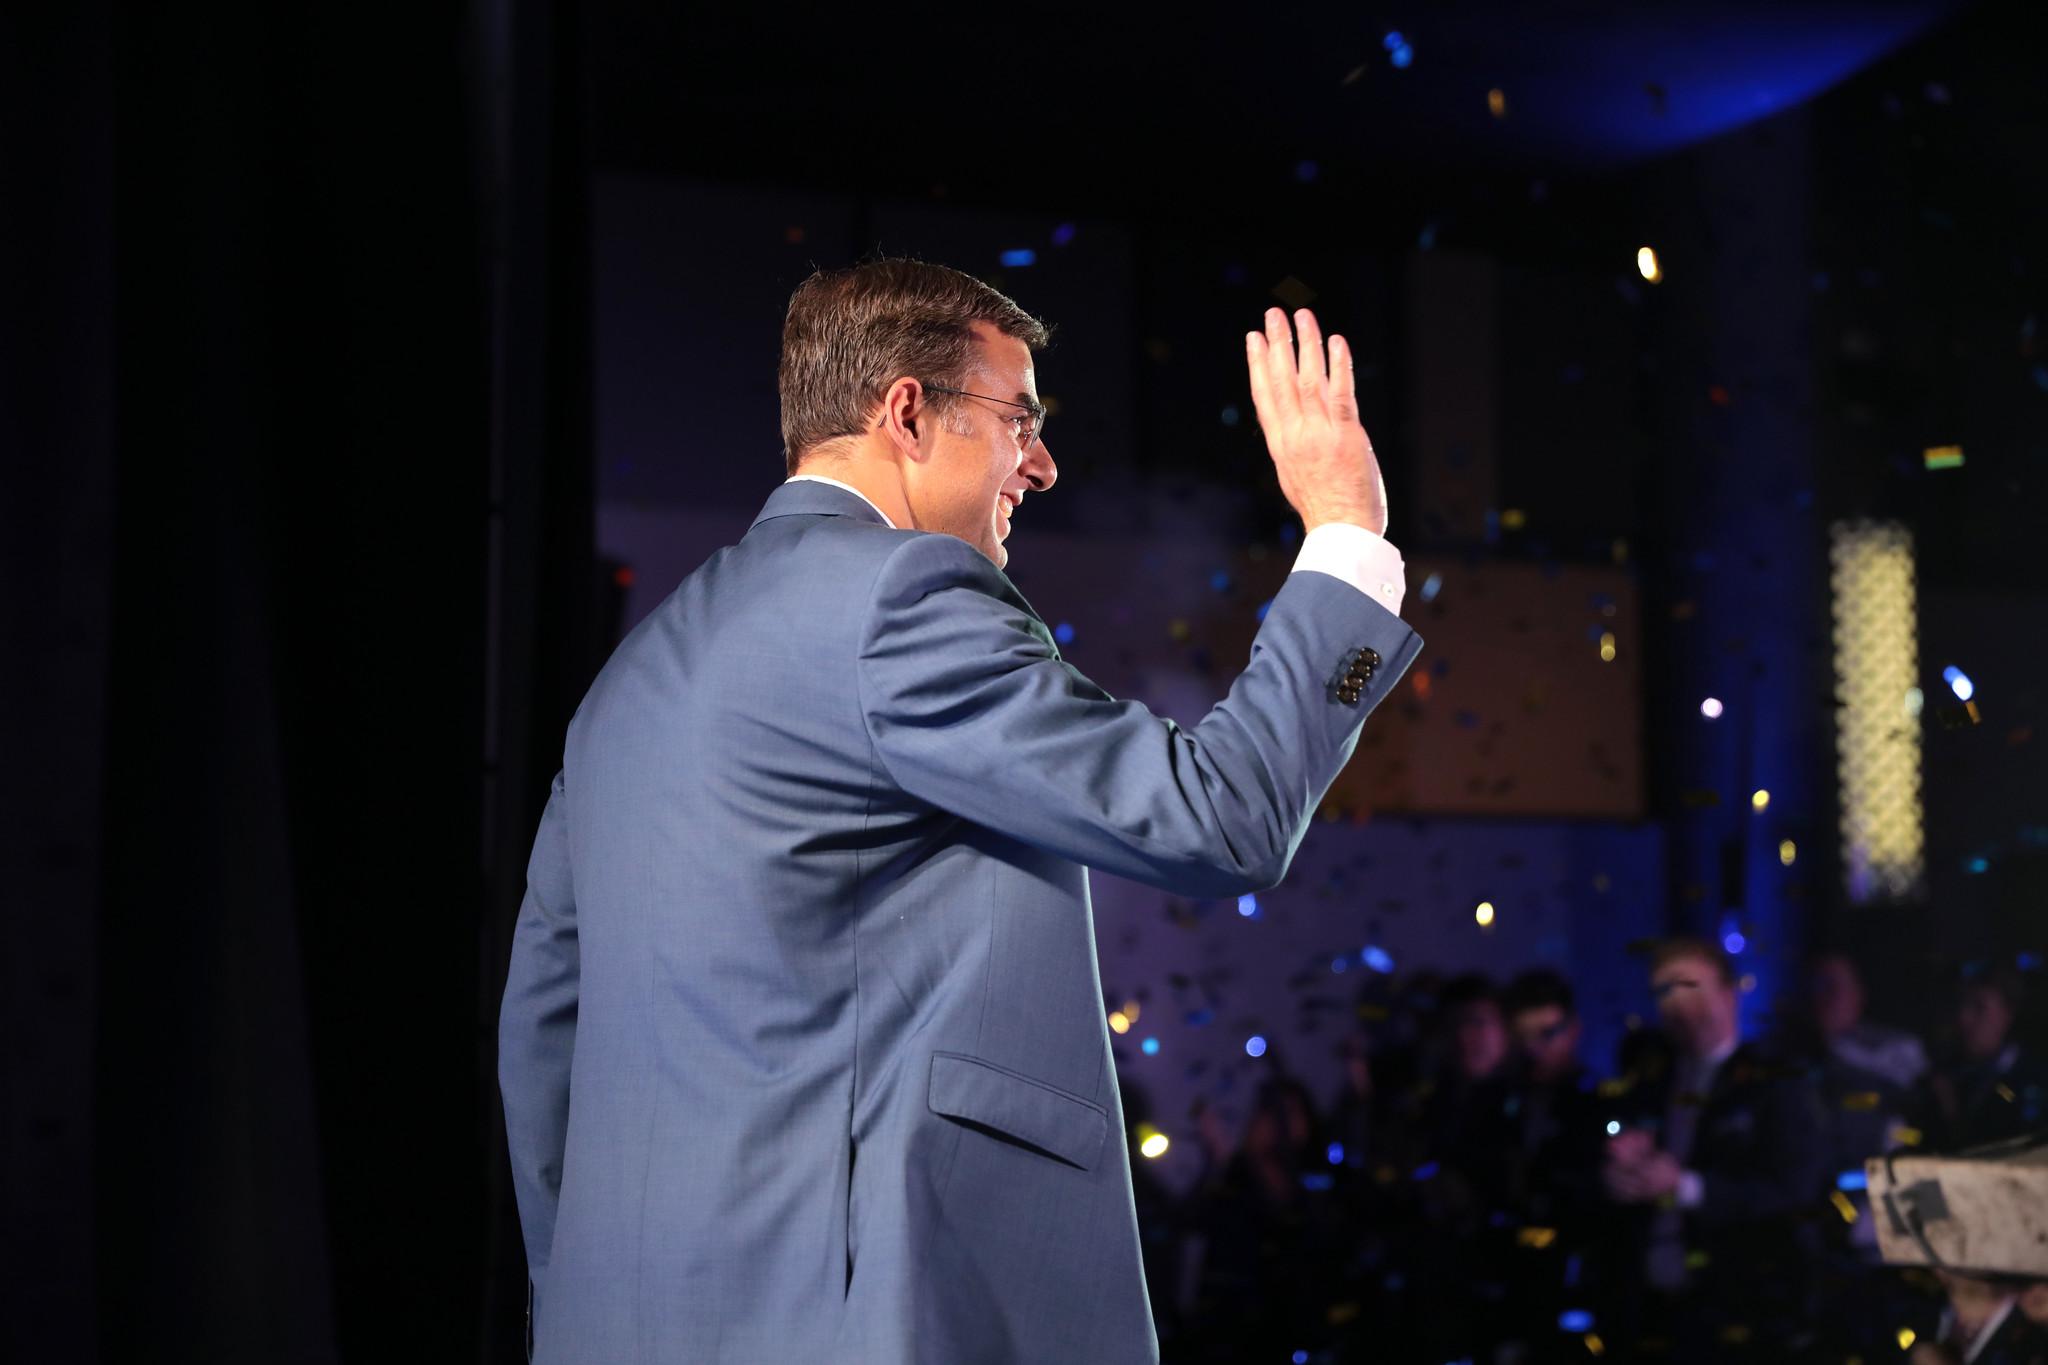 FITSNews – Justin Amash Won't Seek The Presidency In 2020